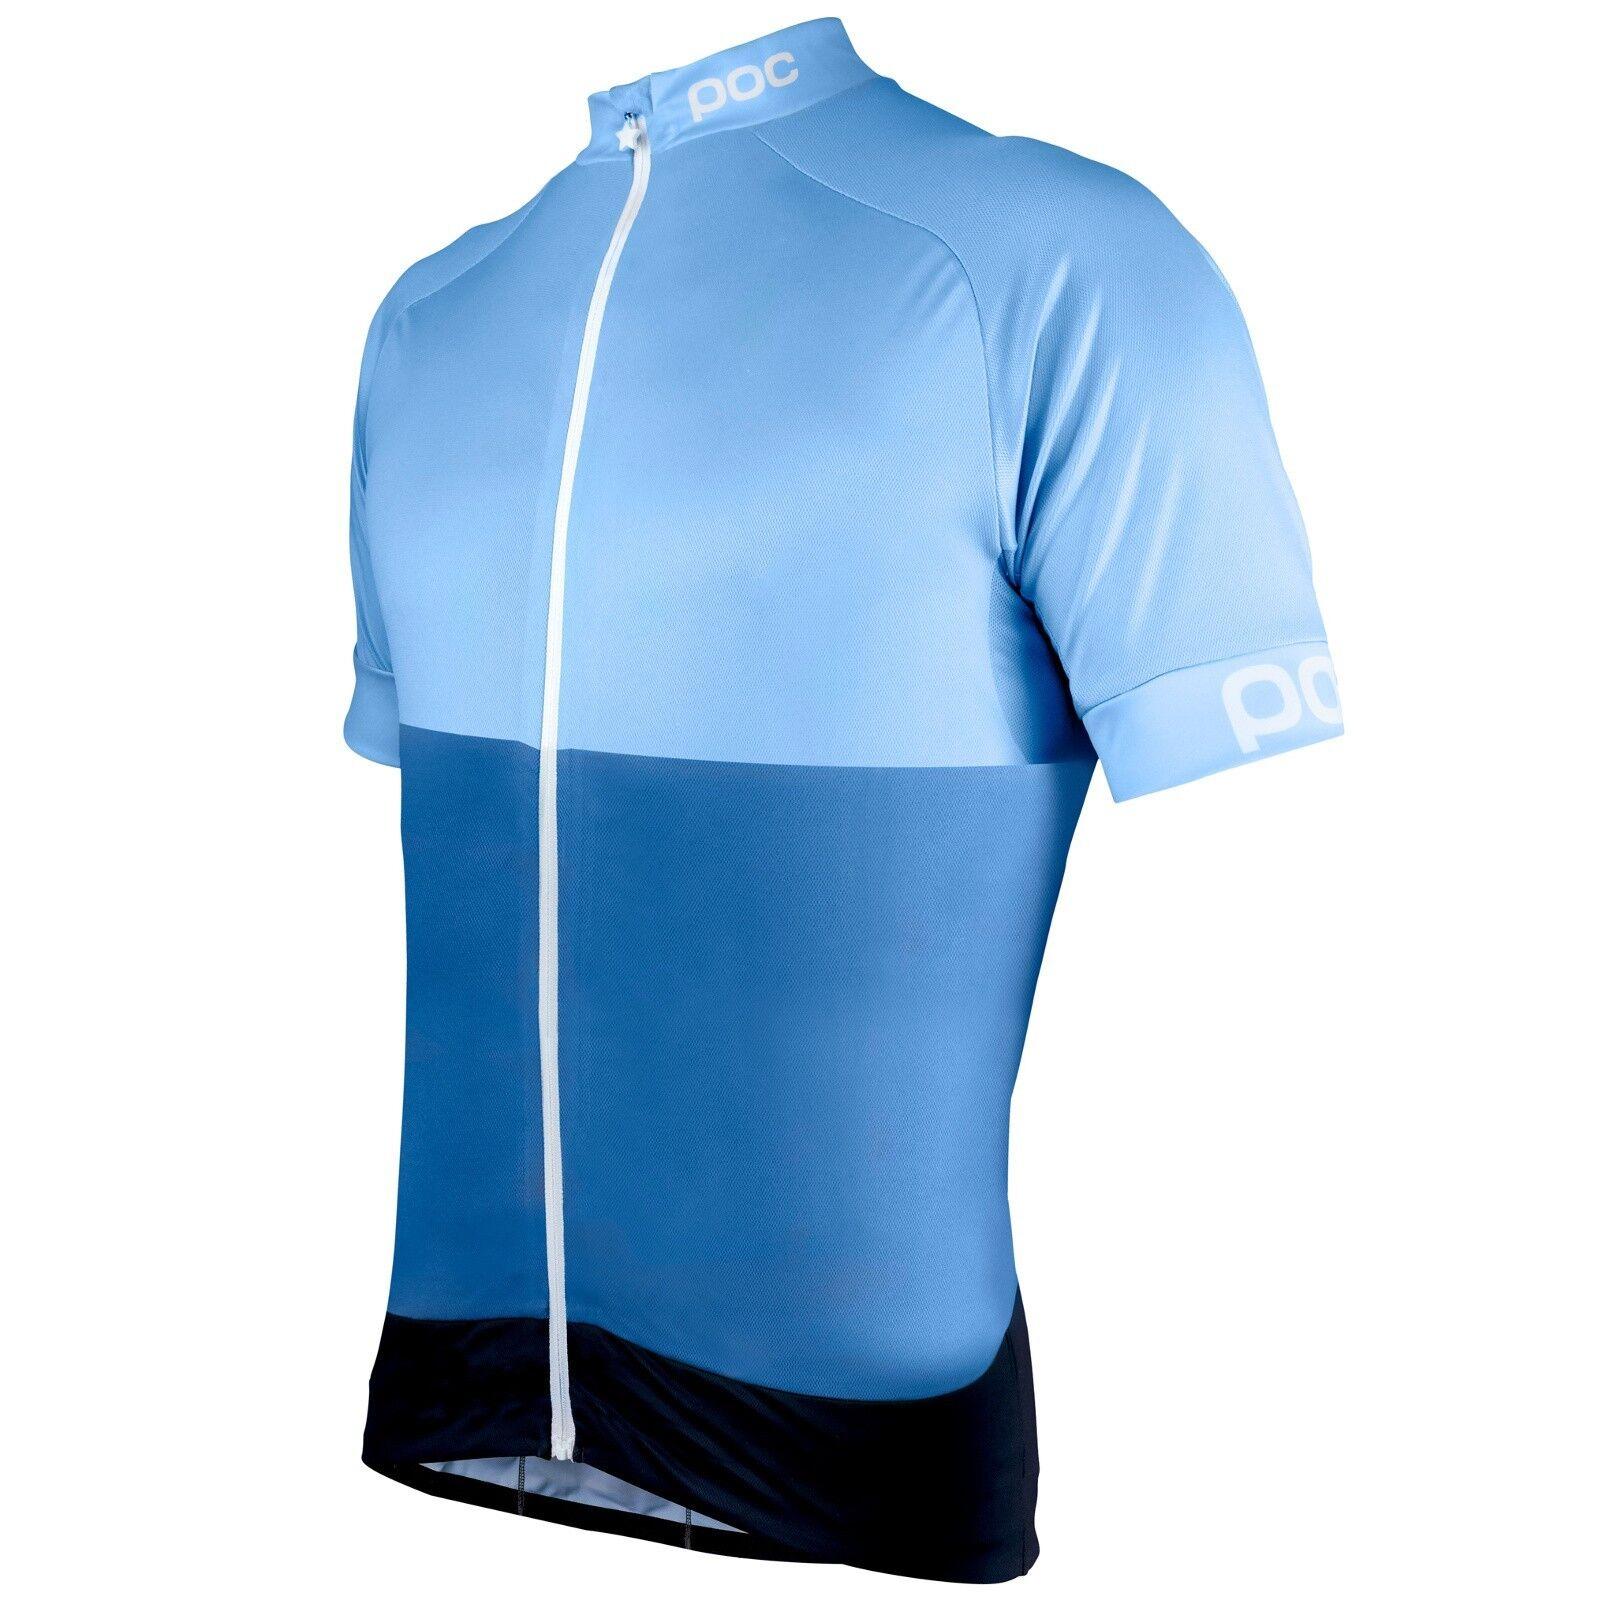 POC Fondo Light Jersey Classic Medium Multi Blau, Medium Classic 5ecb6d